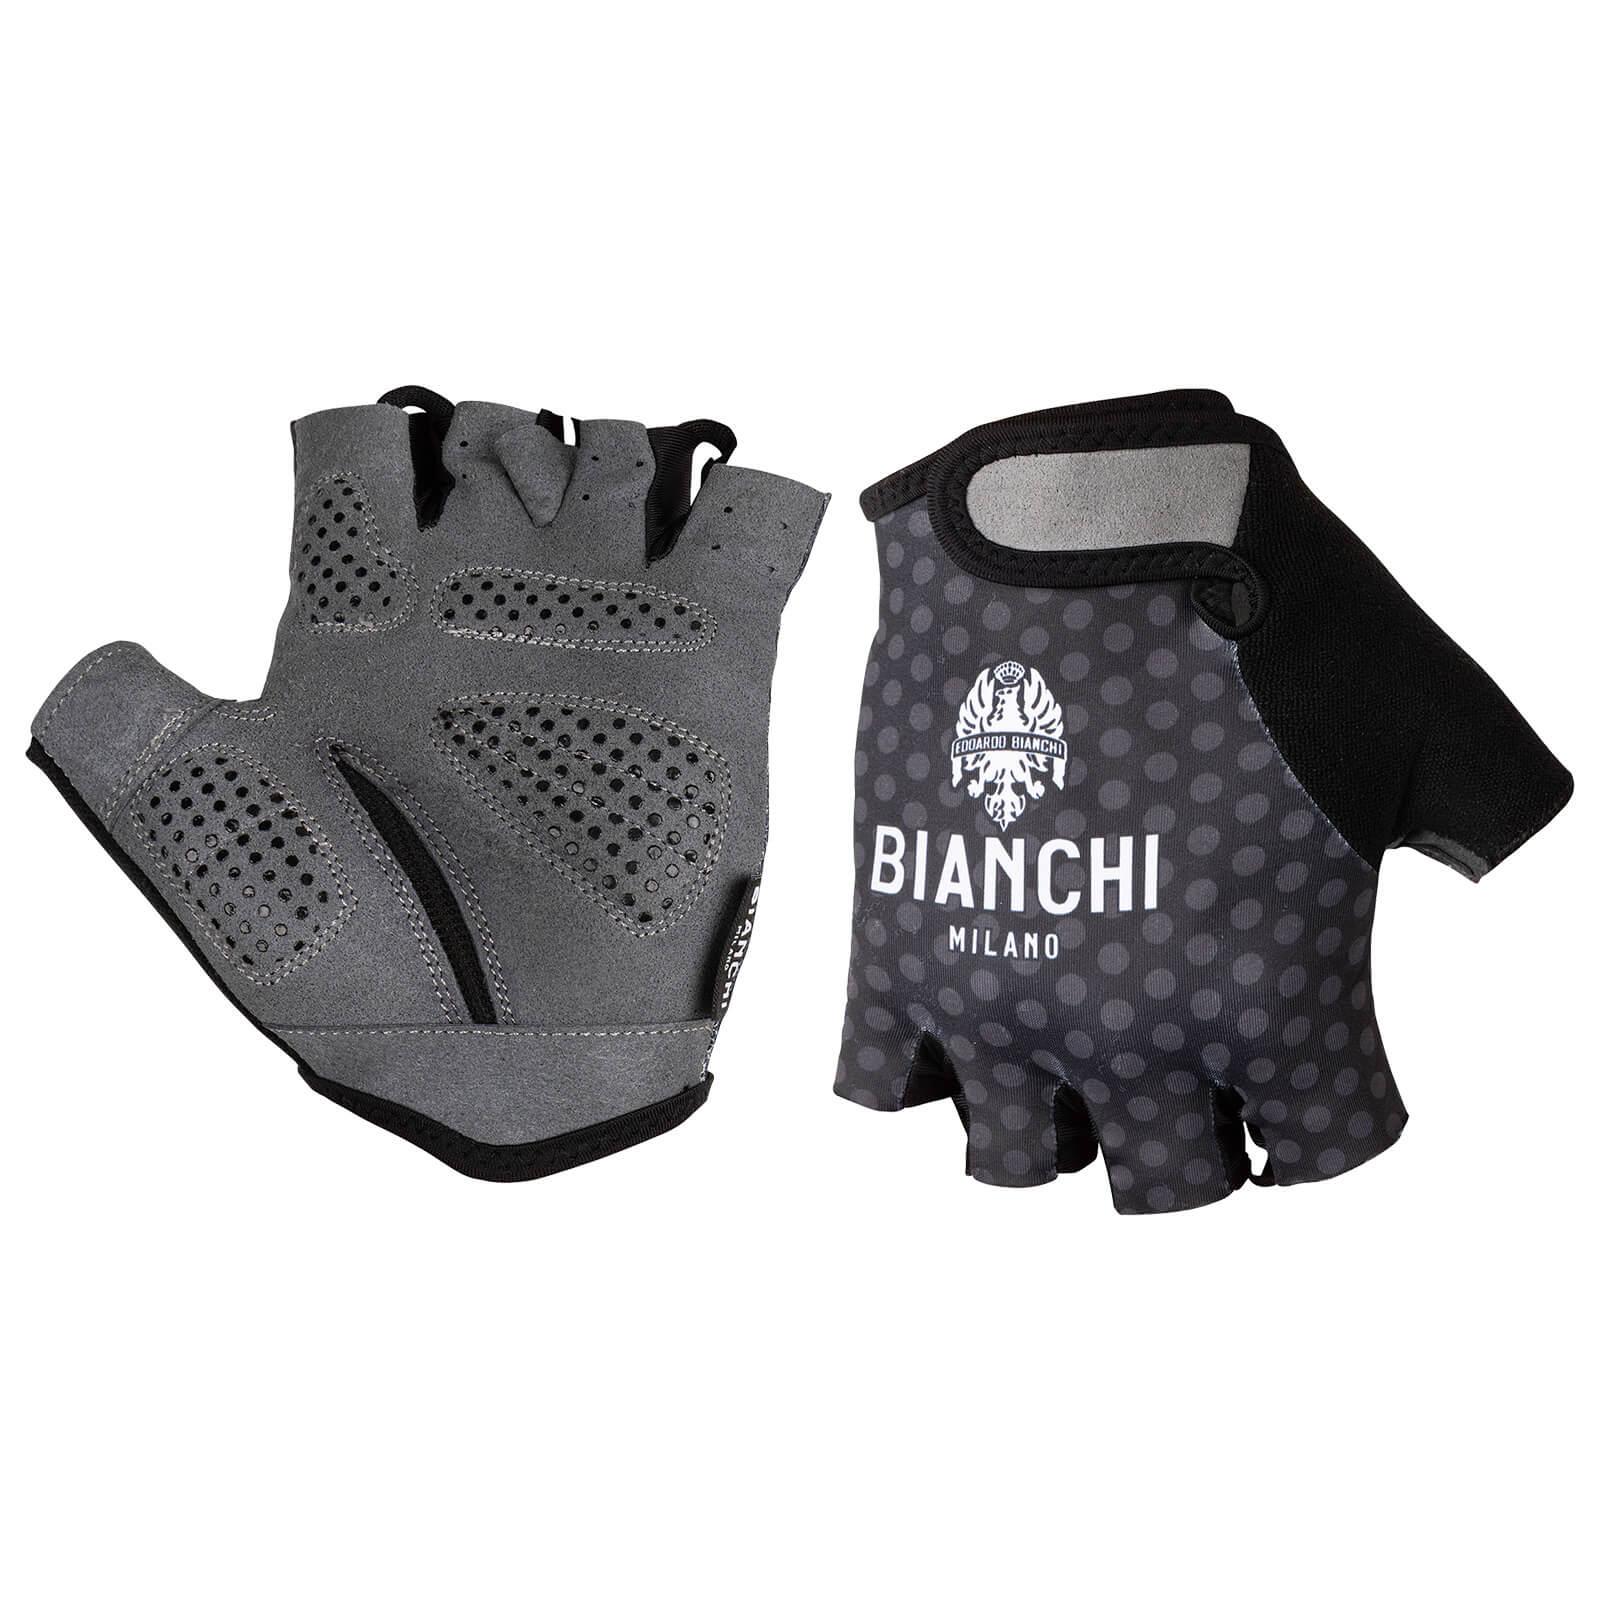 Bianchi Alvia Mitts - XXL - Black